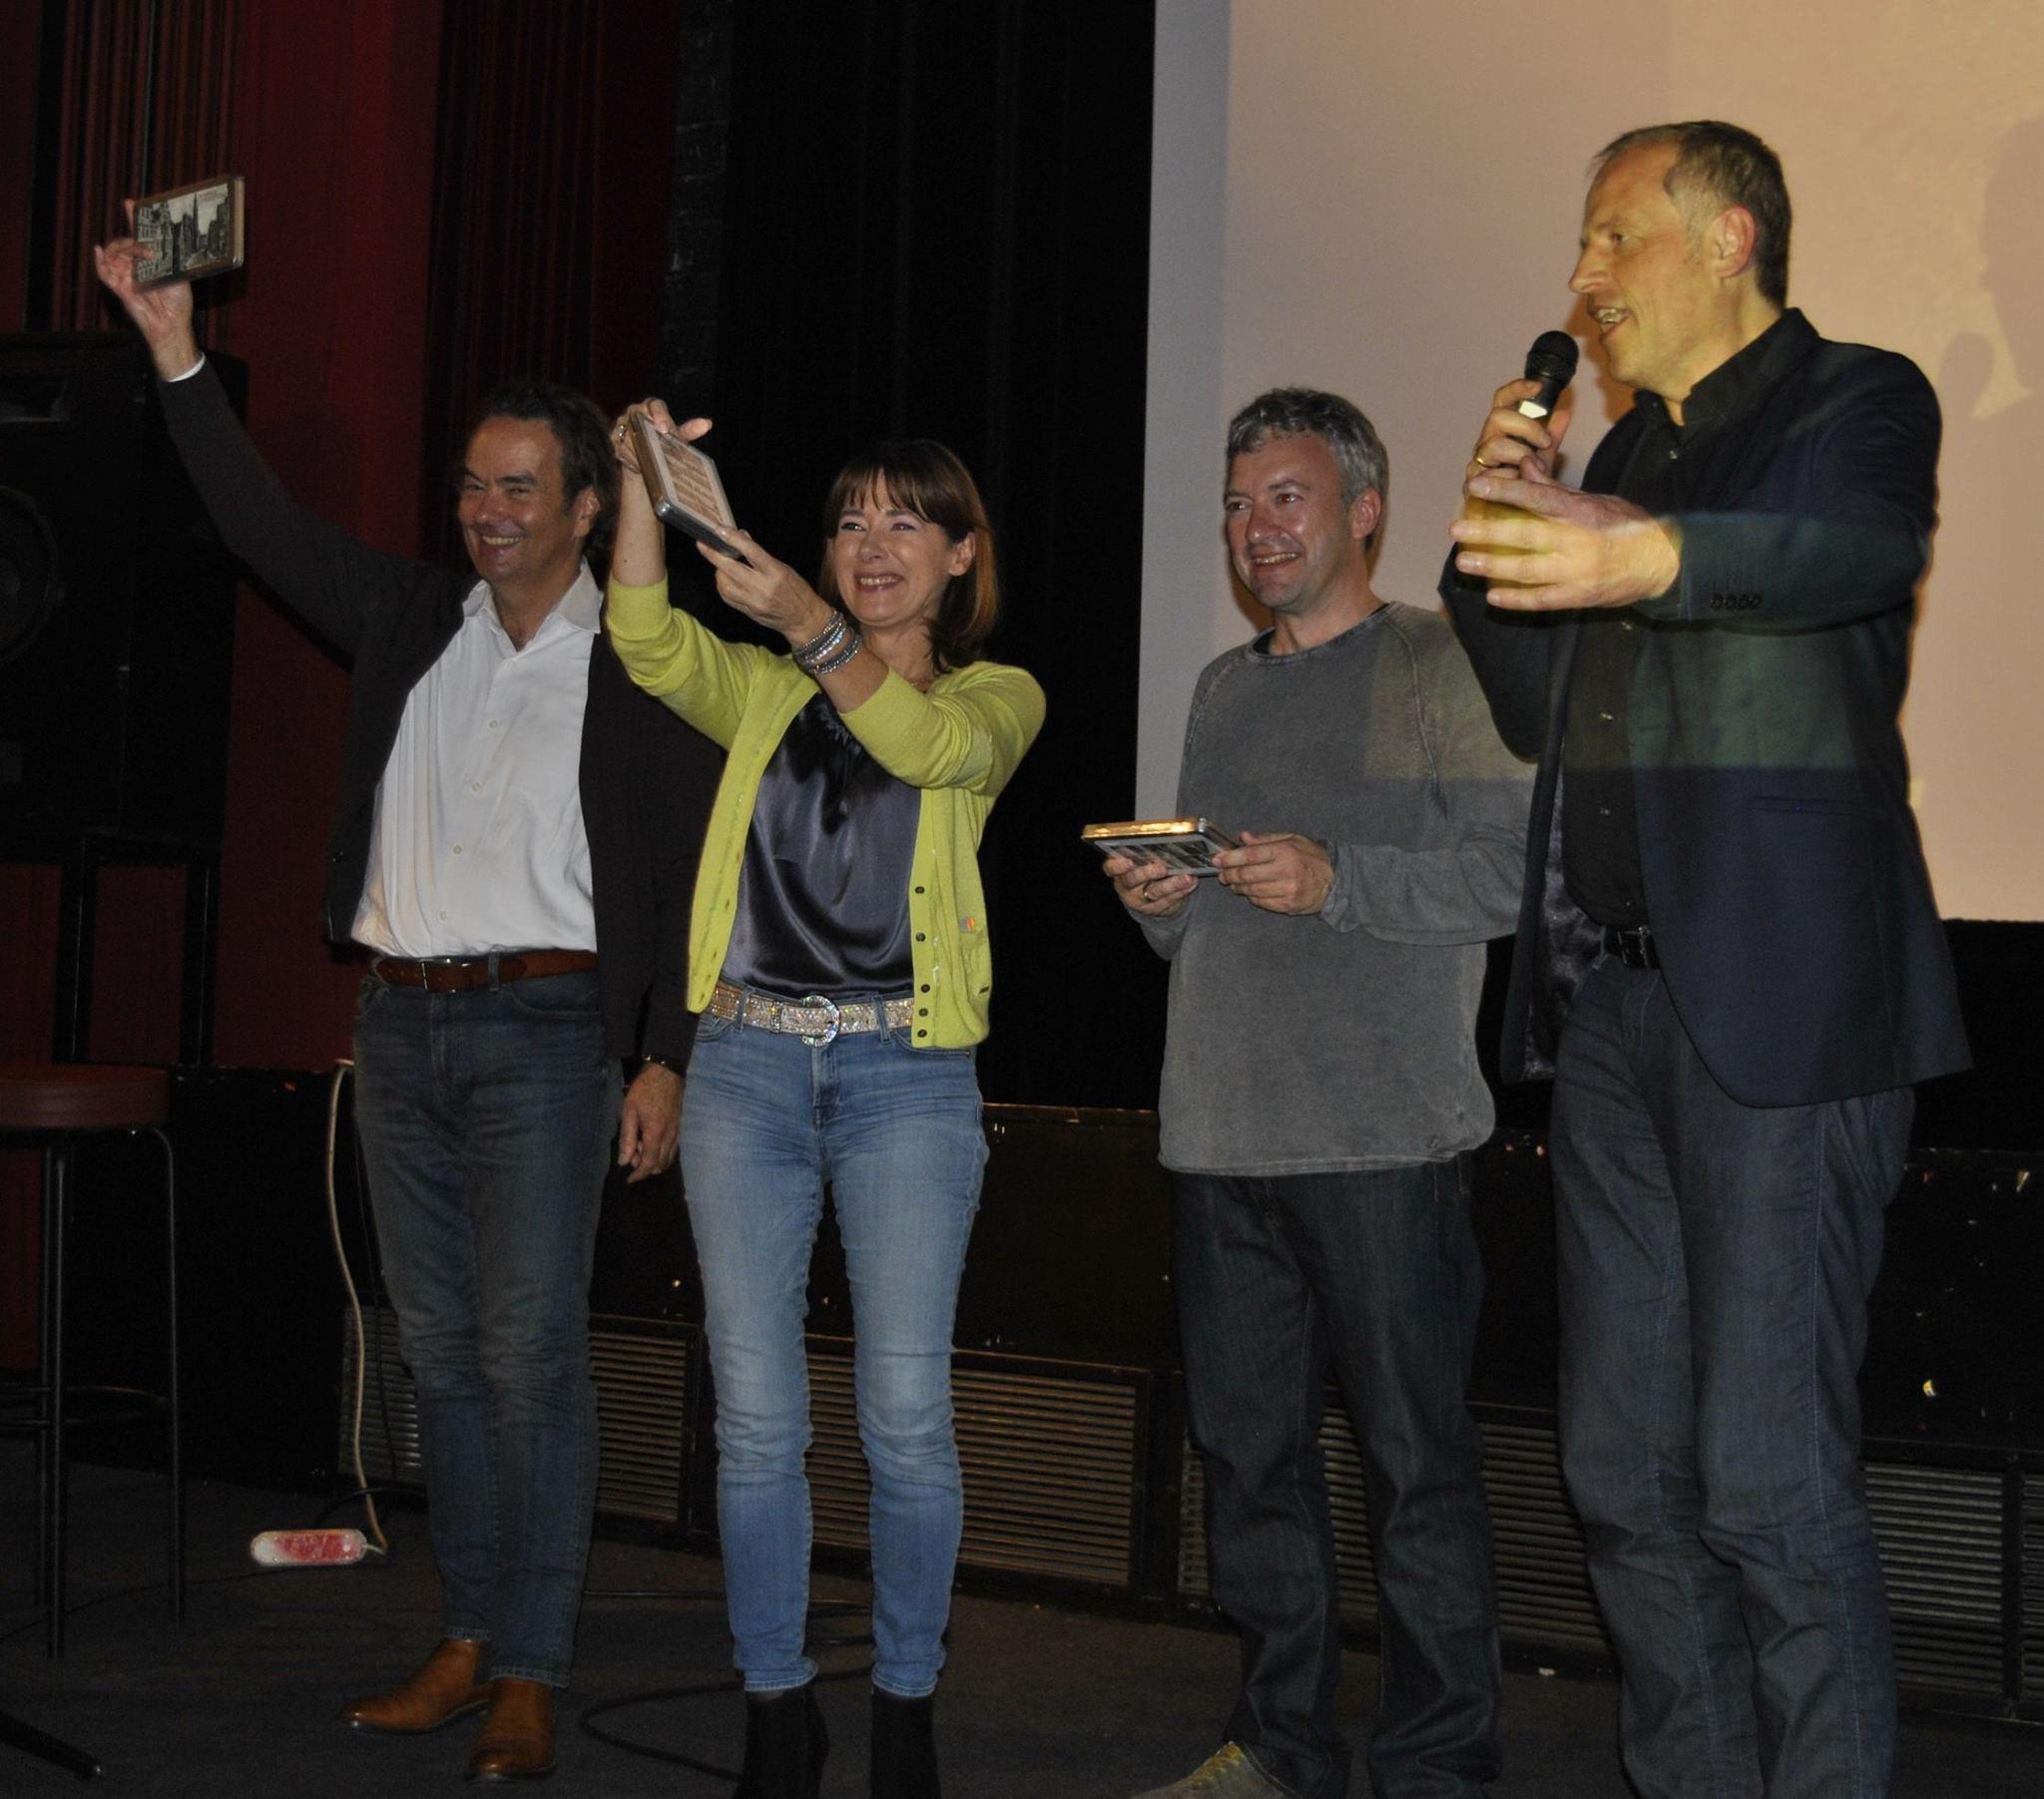 Foto 2 Start: 20. Augsburger Kurzfilmwochenende